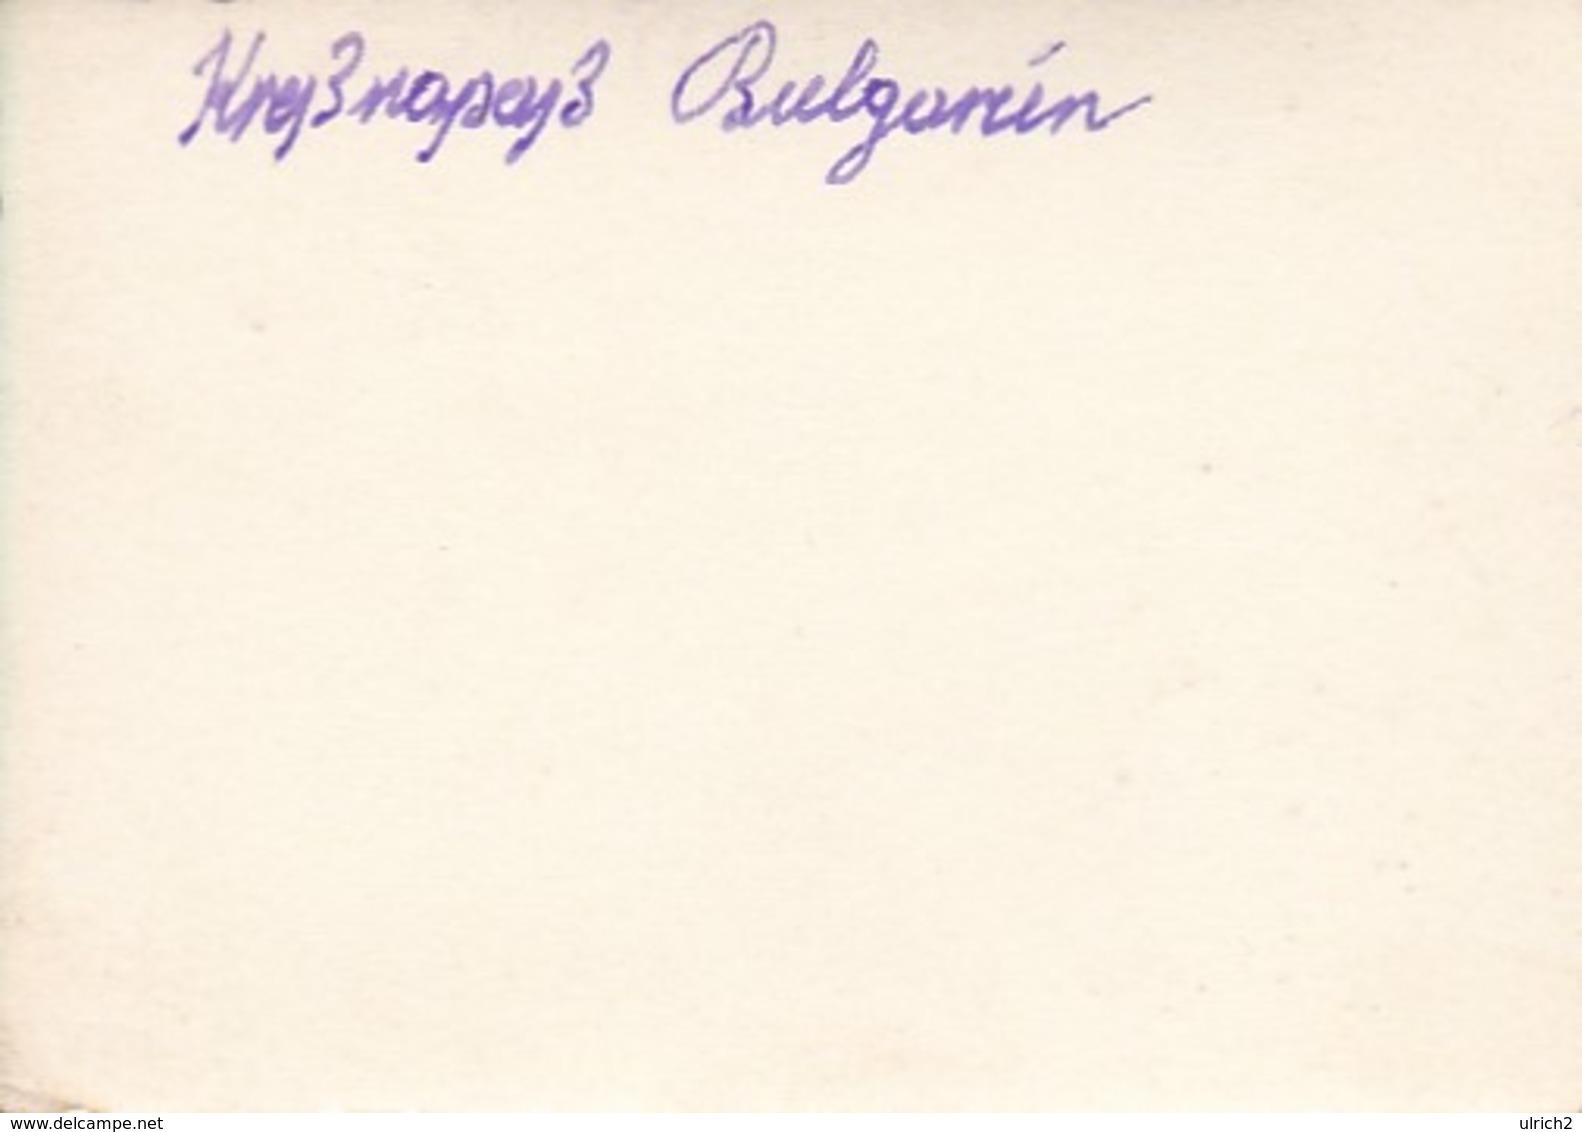 Foto Deutsche Kolonne - Kresnapass - Kresna Gorge Bulgaria - Pioniere IR 46 - 2. WK - 8*5,5cm (43433) - Krieg, Militär